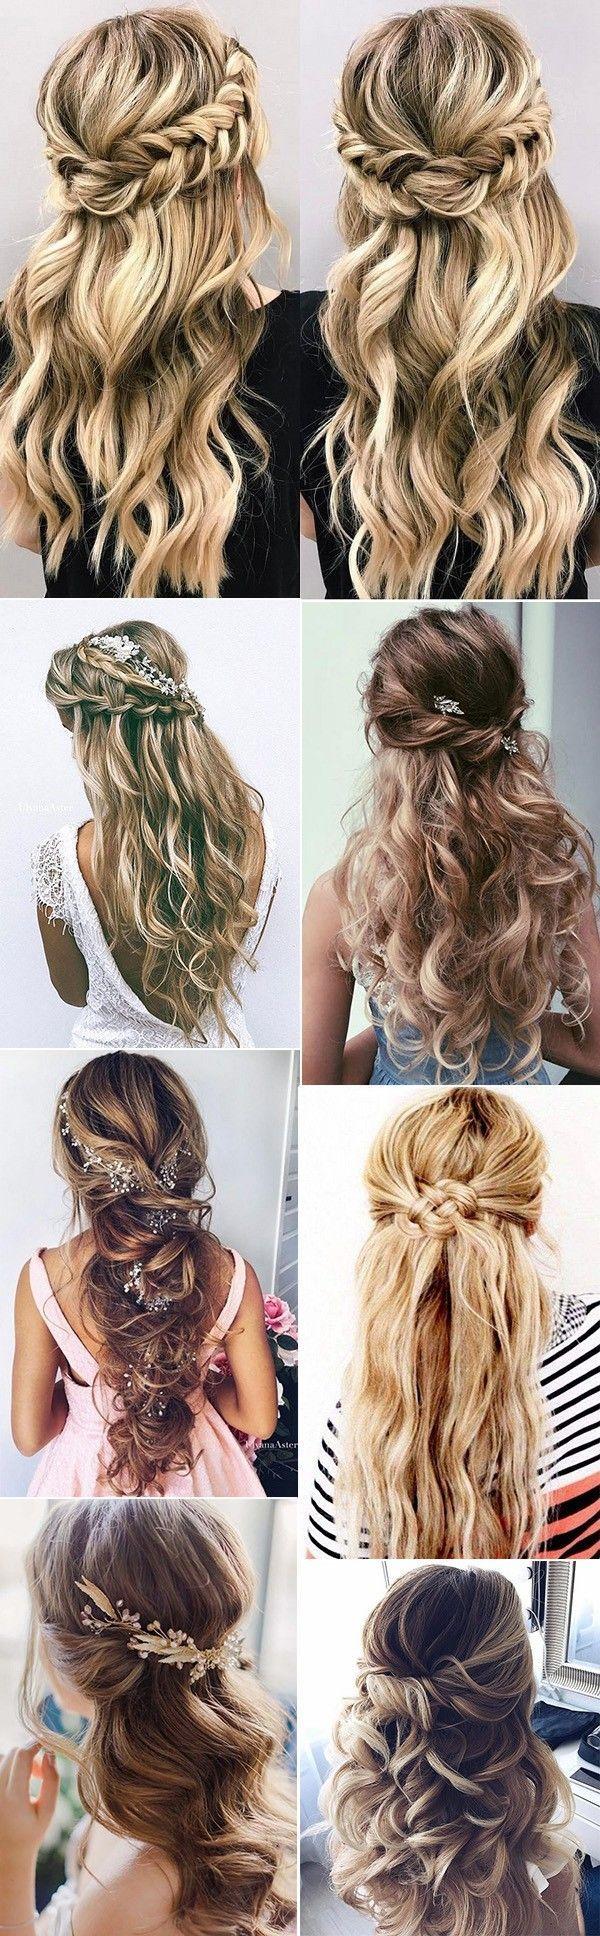 chic half up half down wedding hairstyles for long hair hair